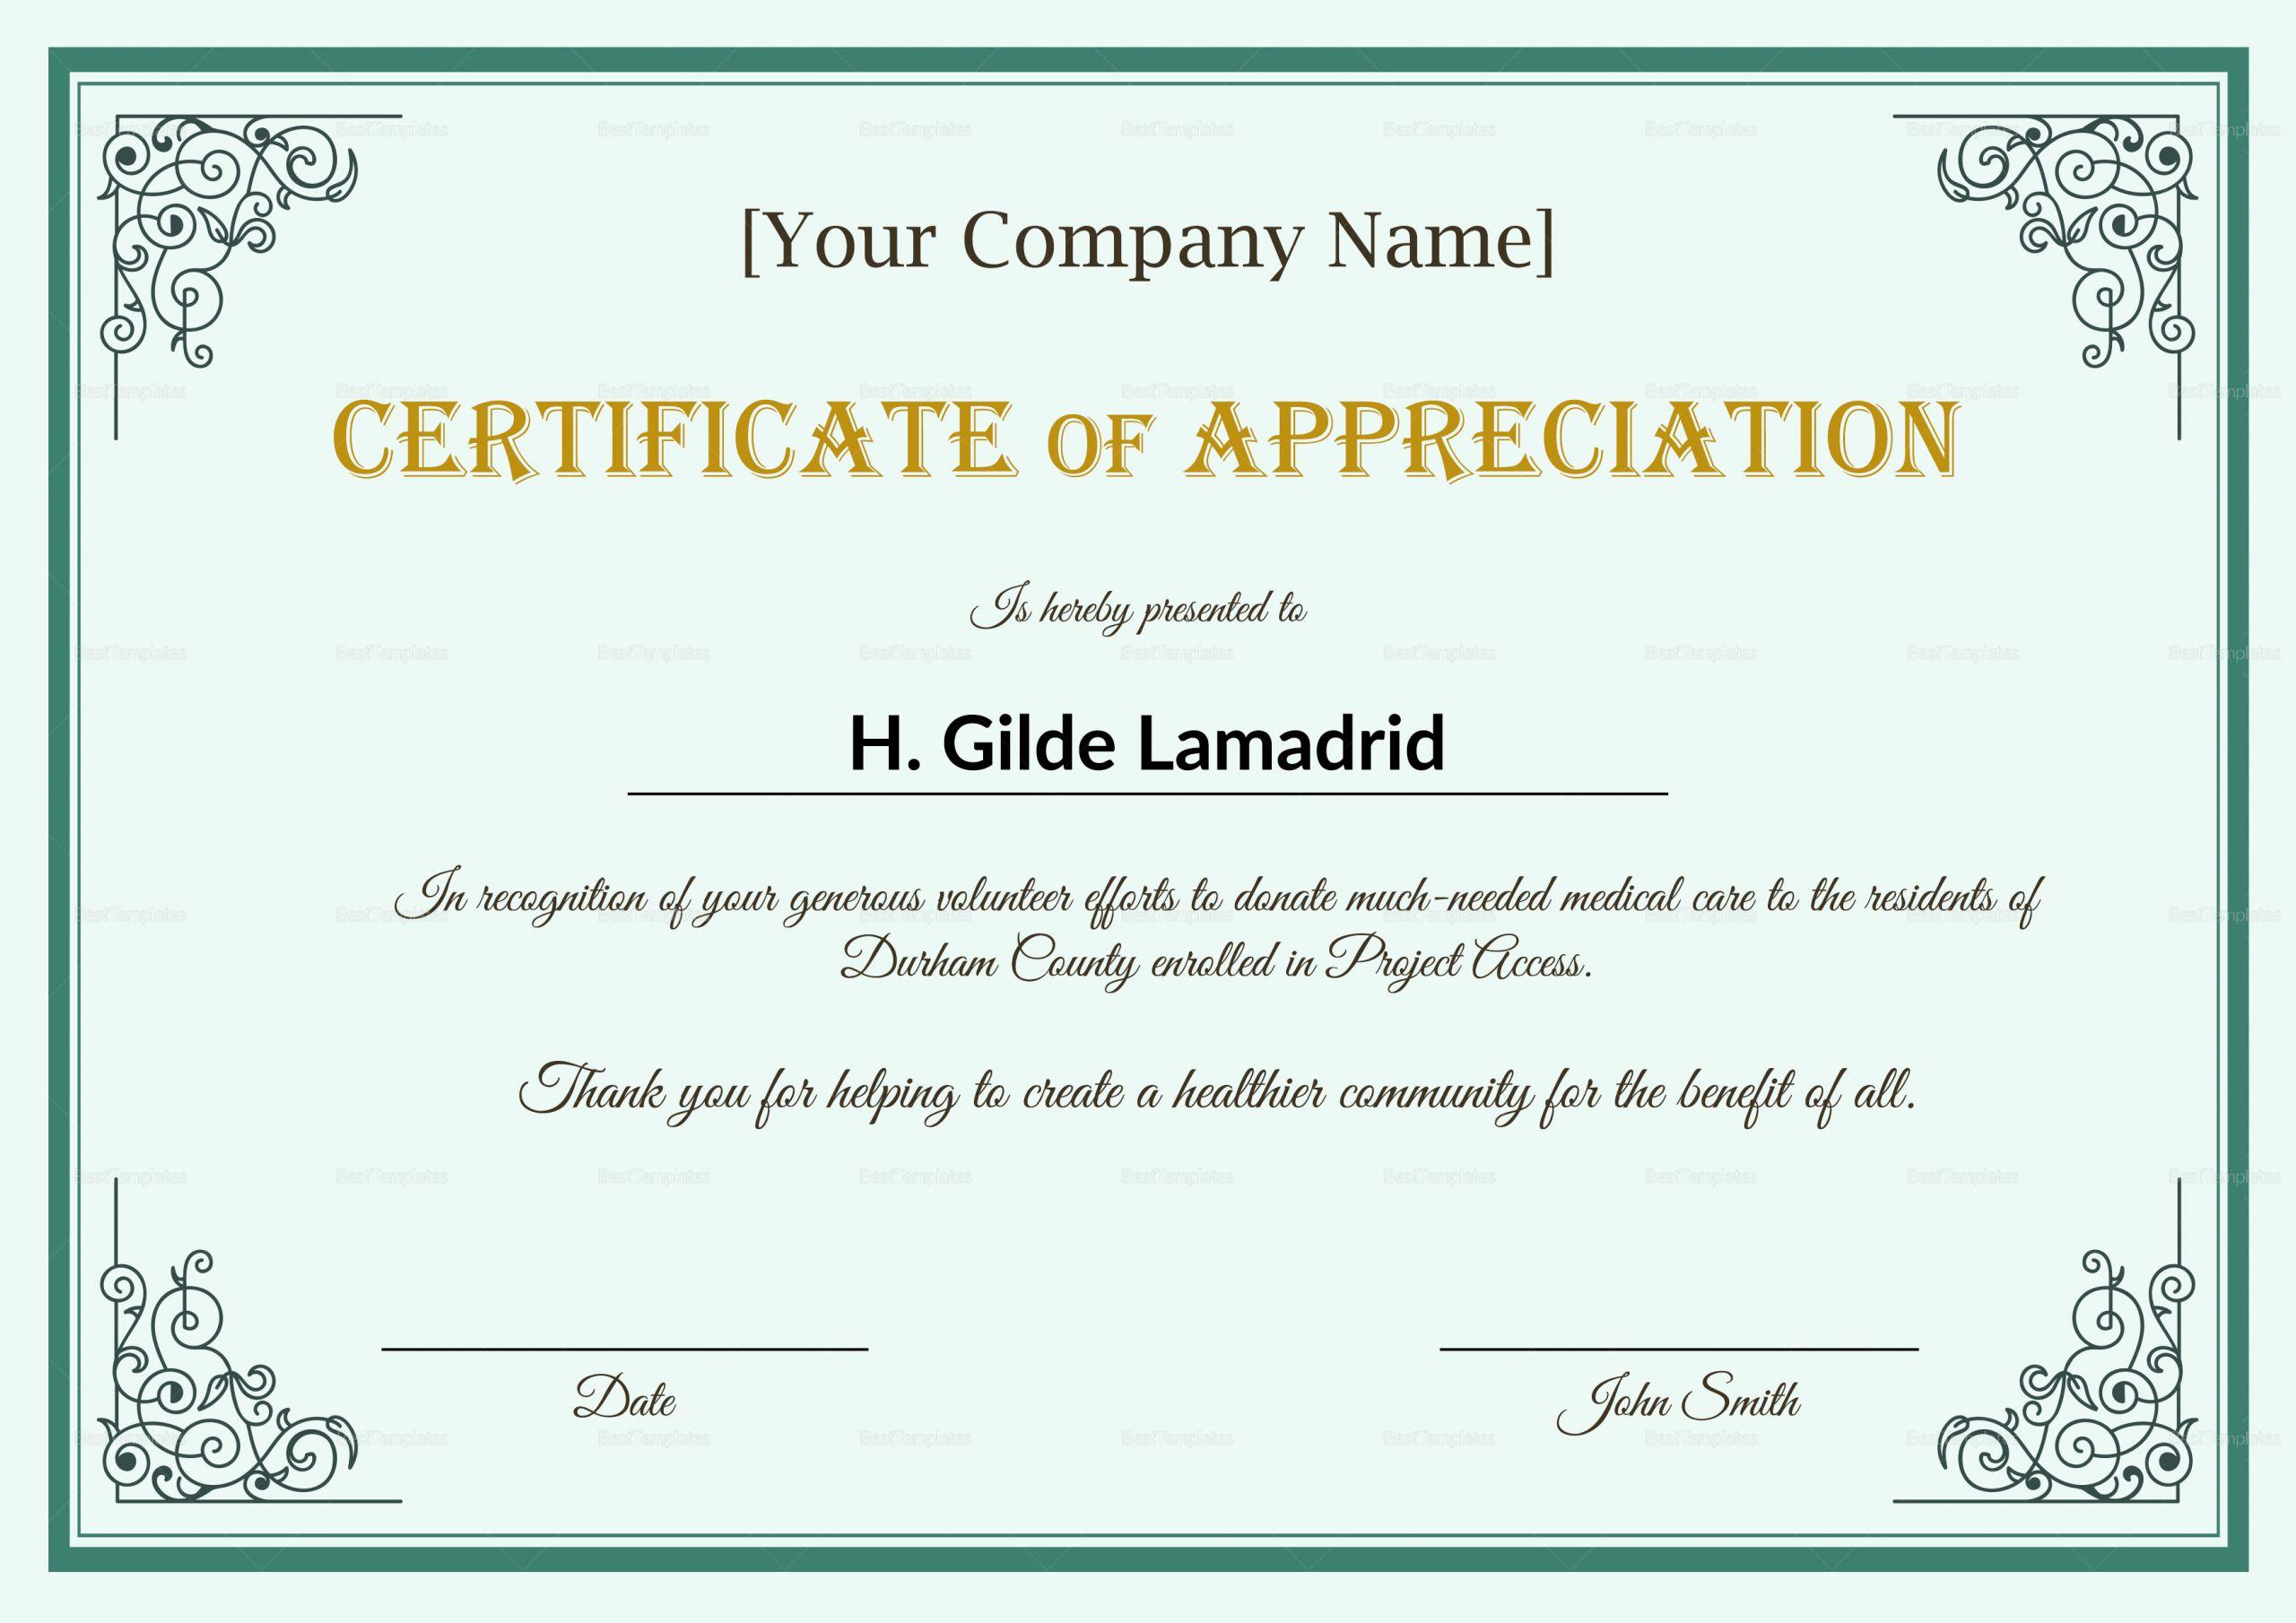 Certificate Of Appreciation Template Powerpoint Luxury Army Certificate Appreciation Template Ppt